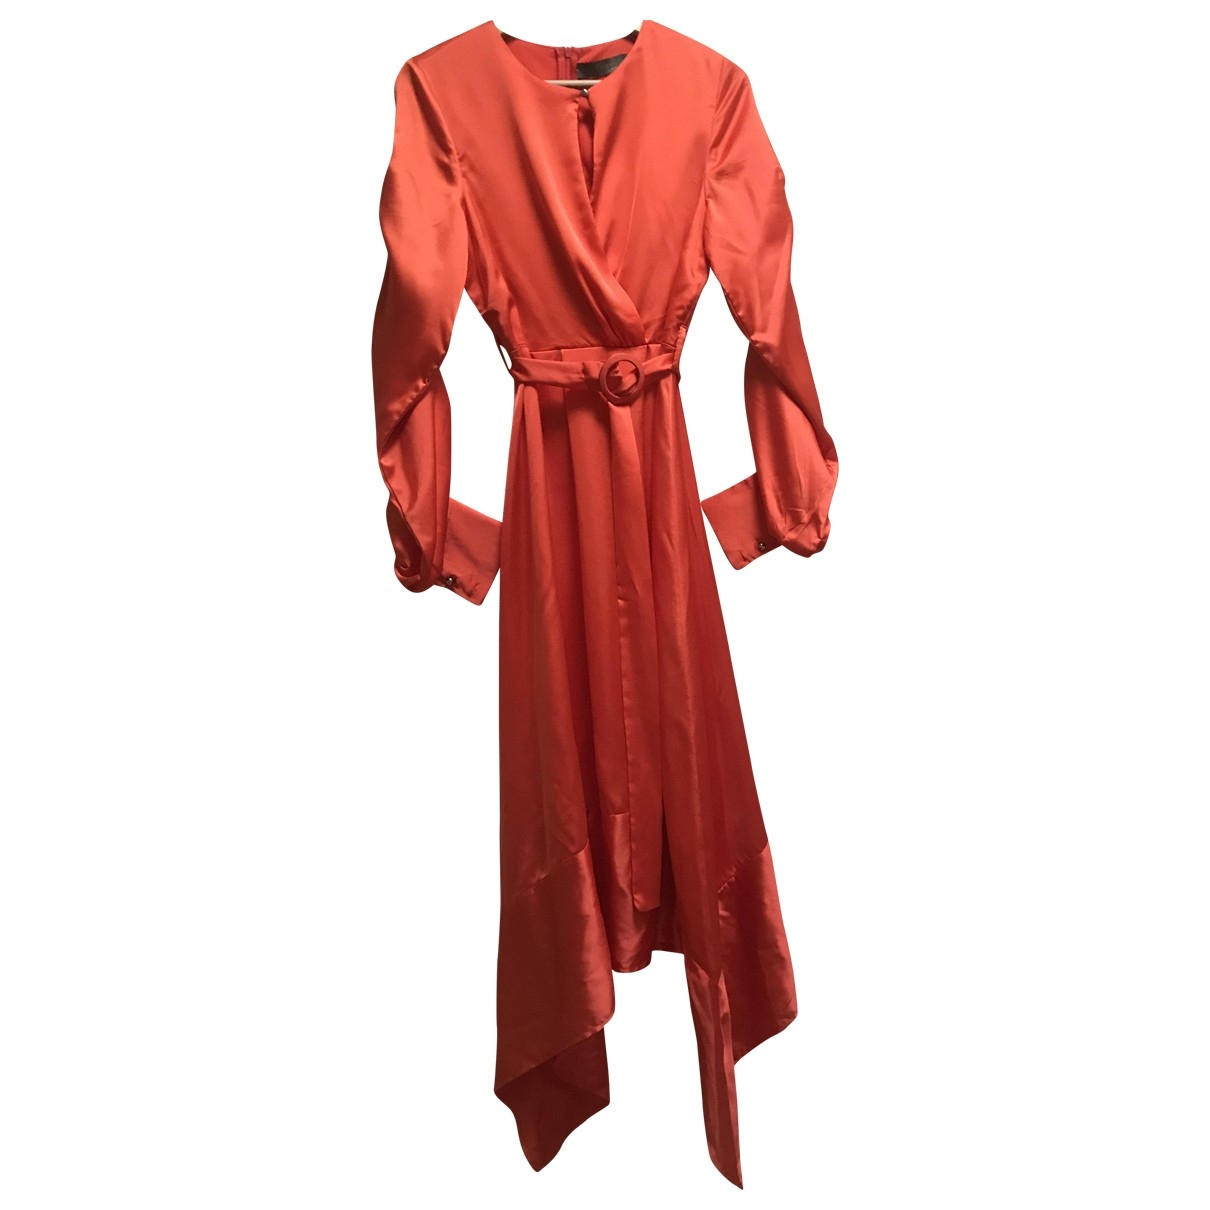 - Robe Manche ballon pour femme en soie - orange